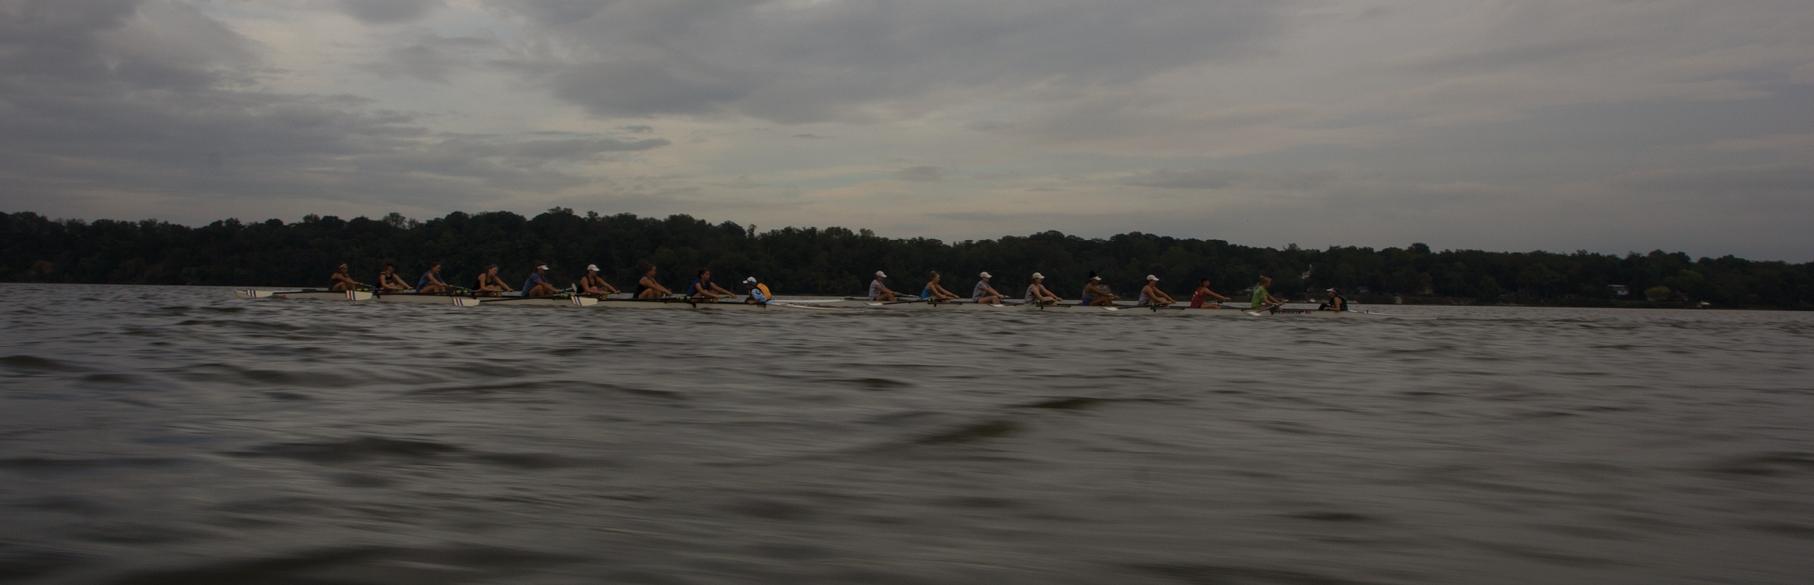 Alexandria Community Rowing practice